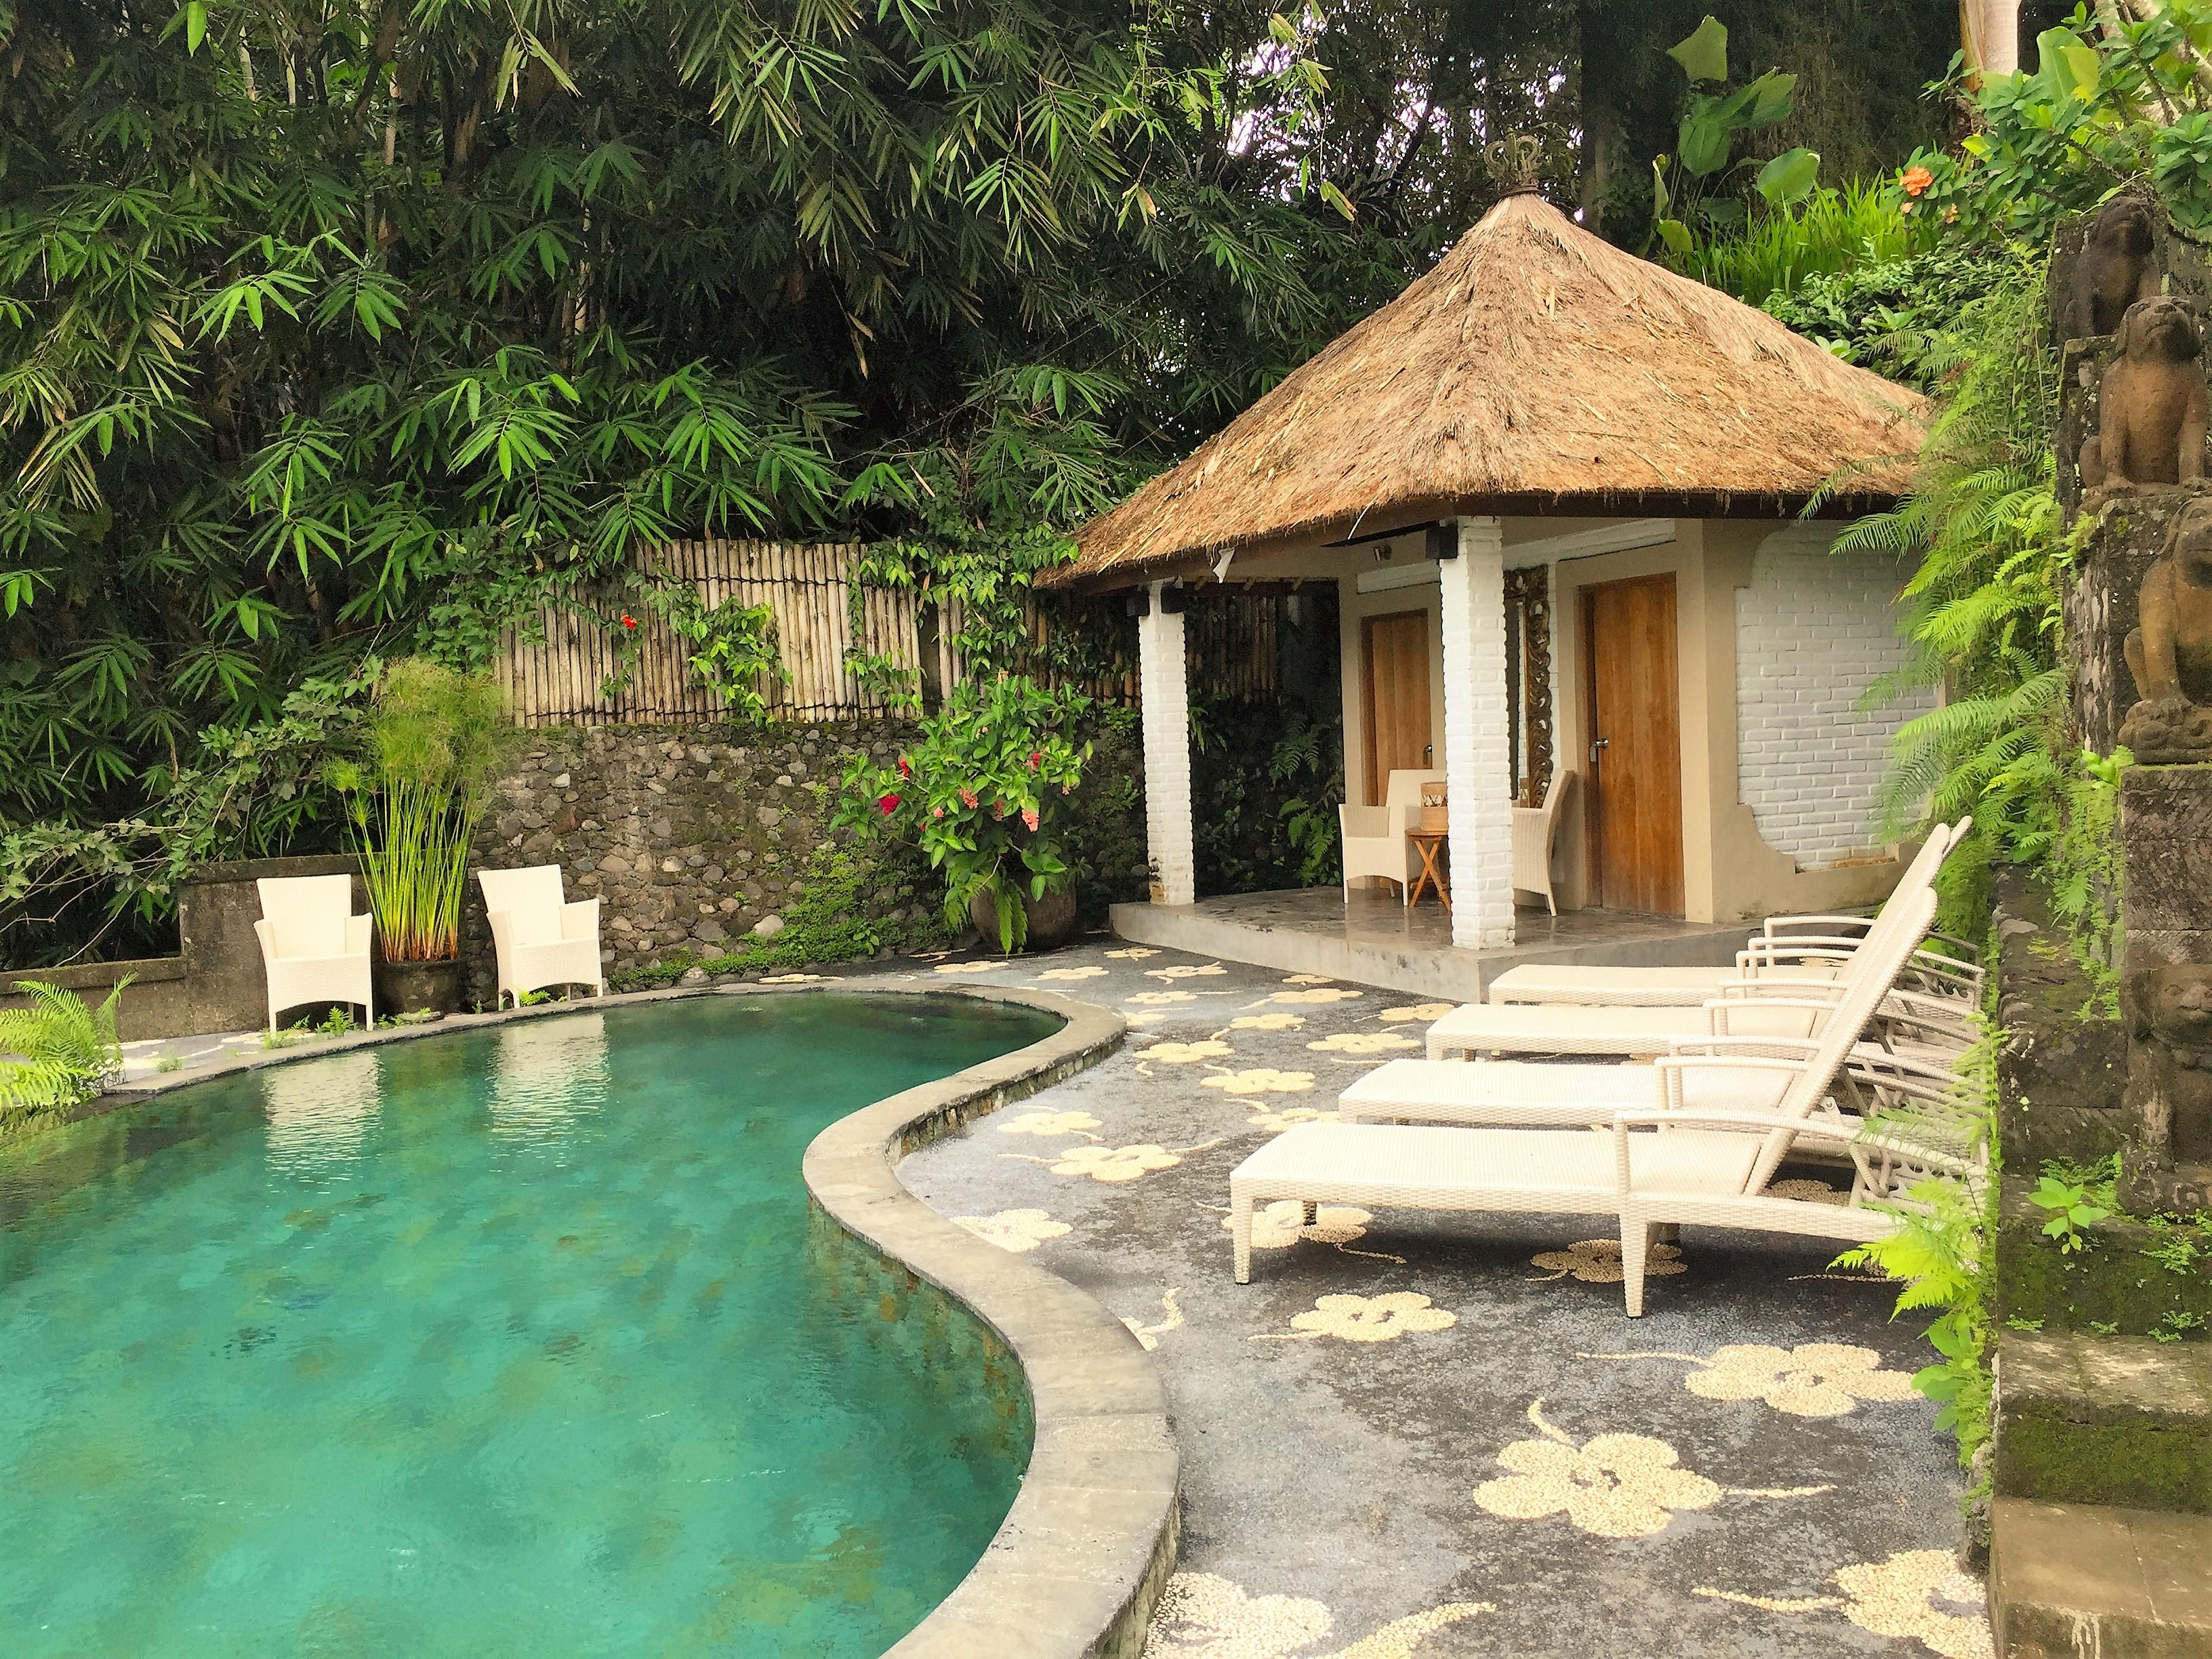 Villa Constance Private Villa With Swimming Pool Villas For Rent In Tegallalang Bali Indonesia